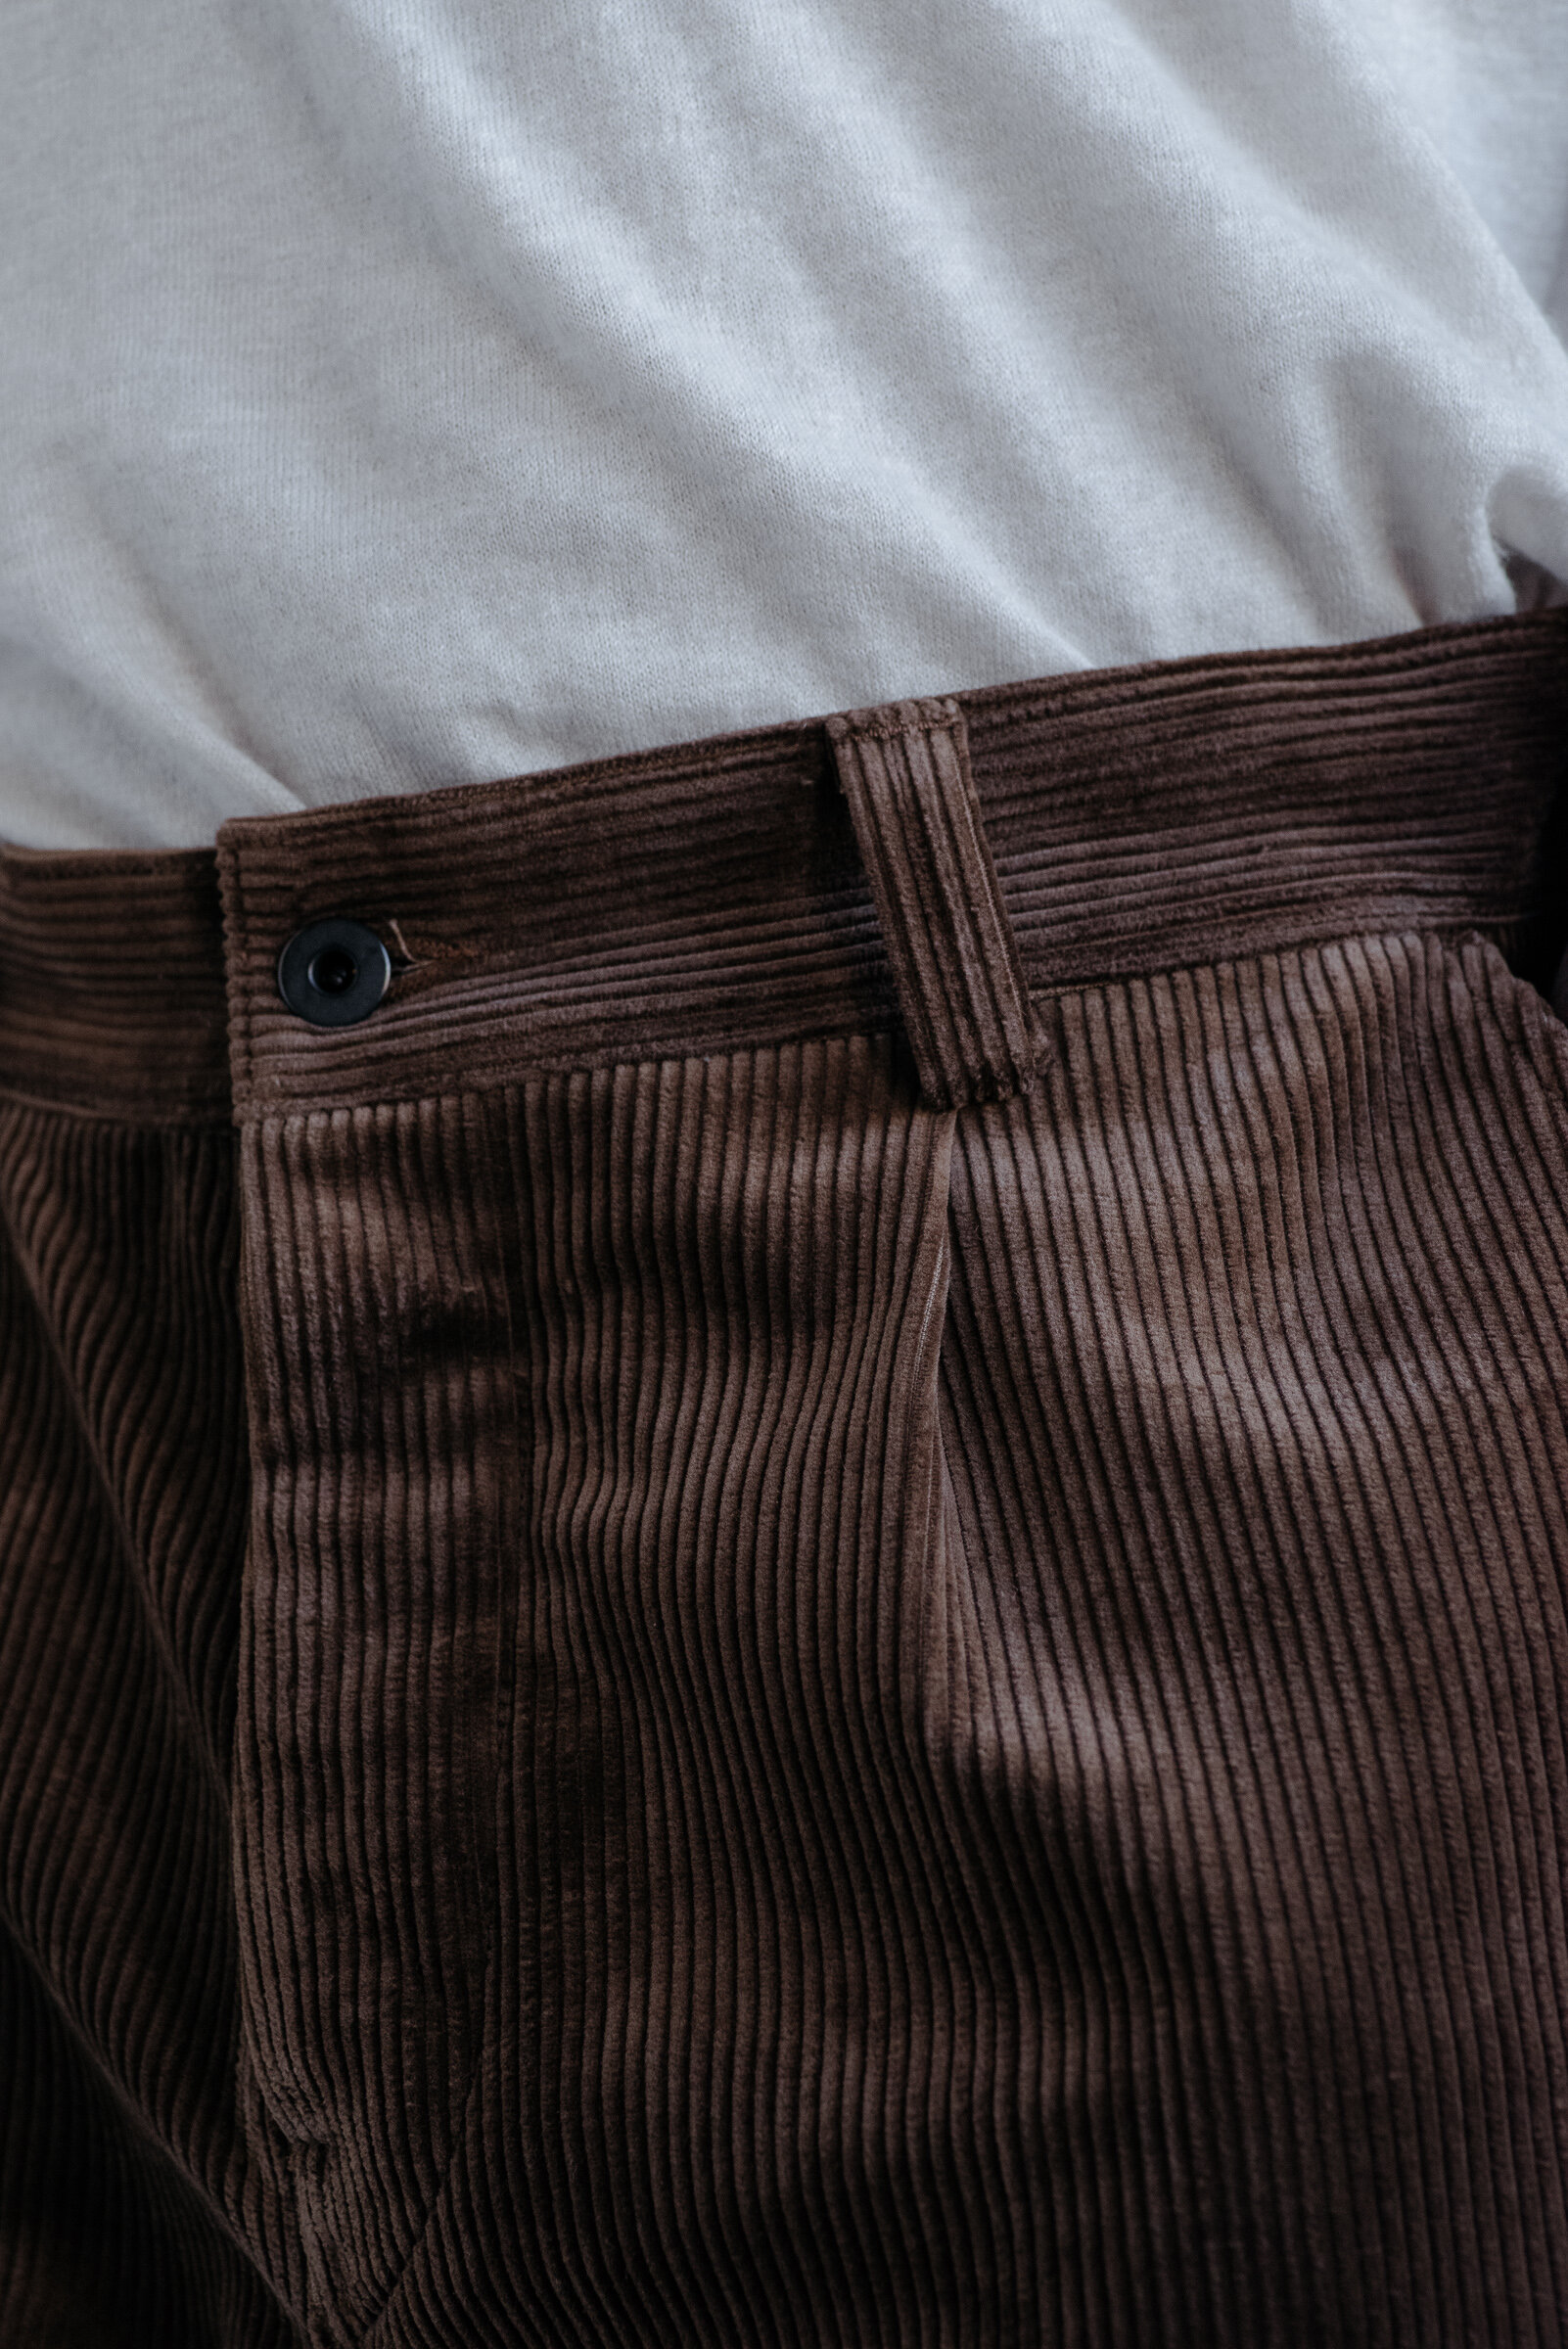 evan-kinori-single-pleat-pant-organic-cotton-corduroy-woven-in-germany-4